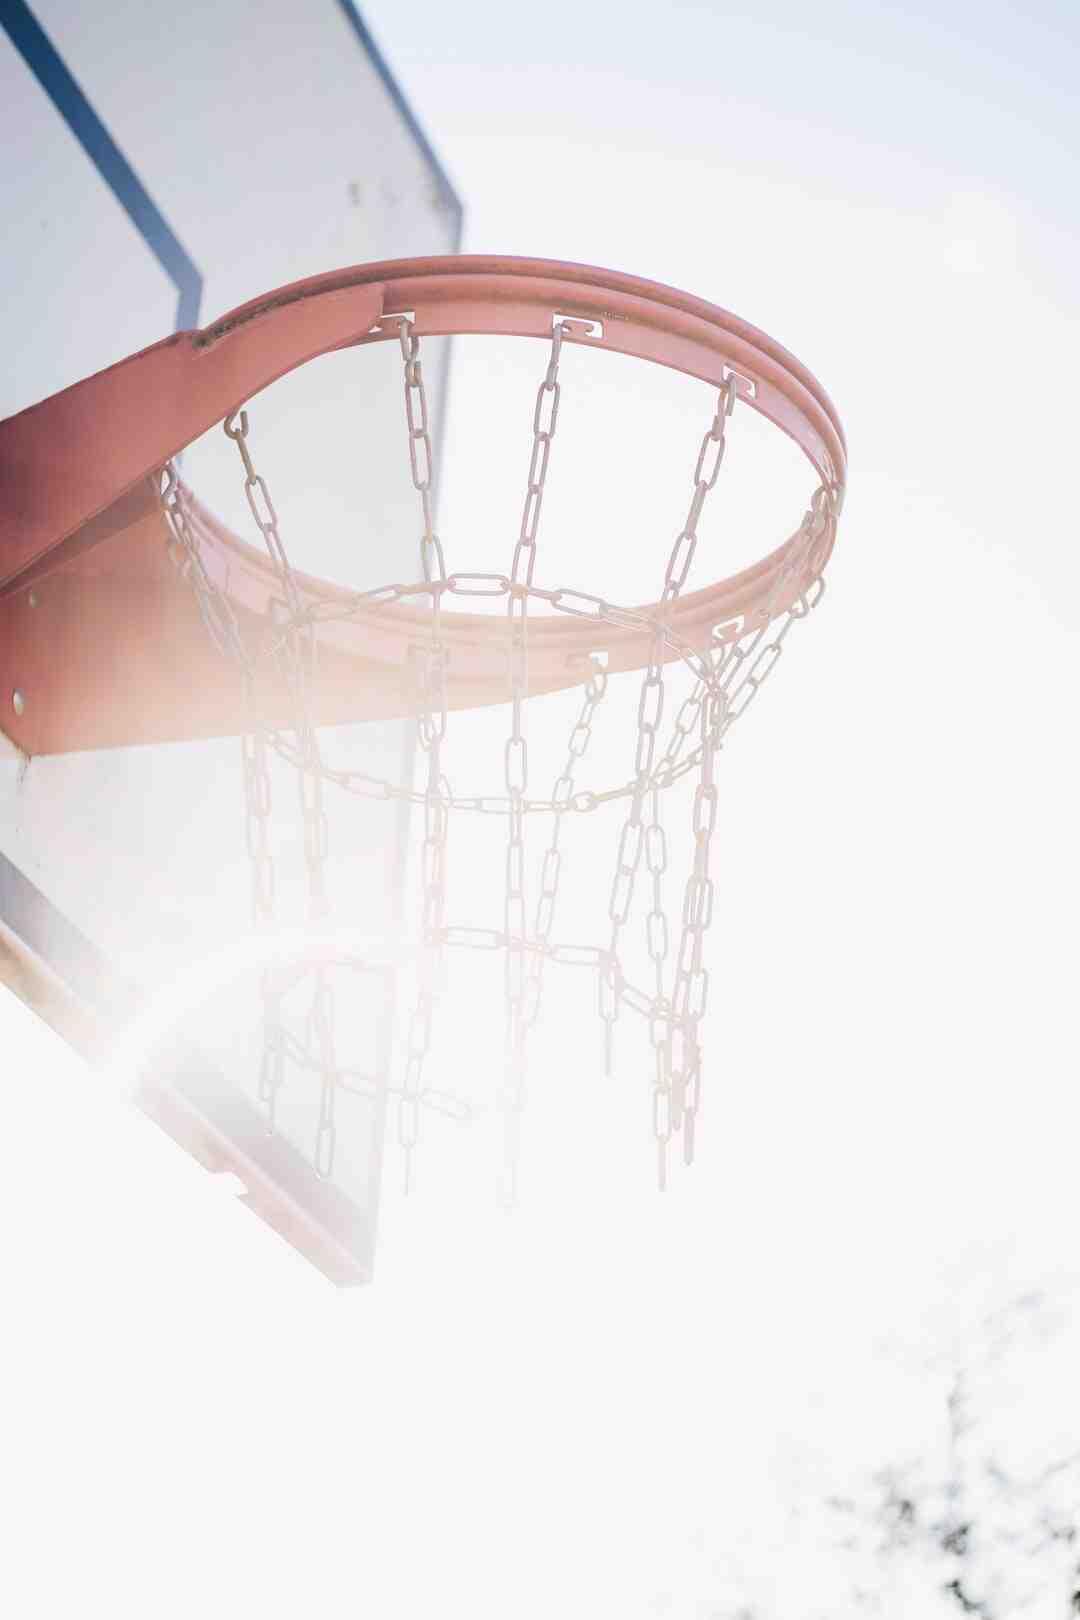 Où jouer au Basket-ball ?